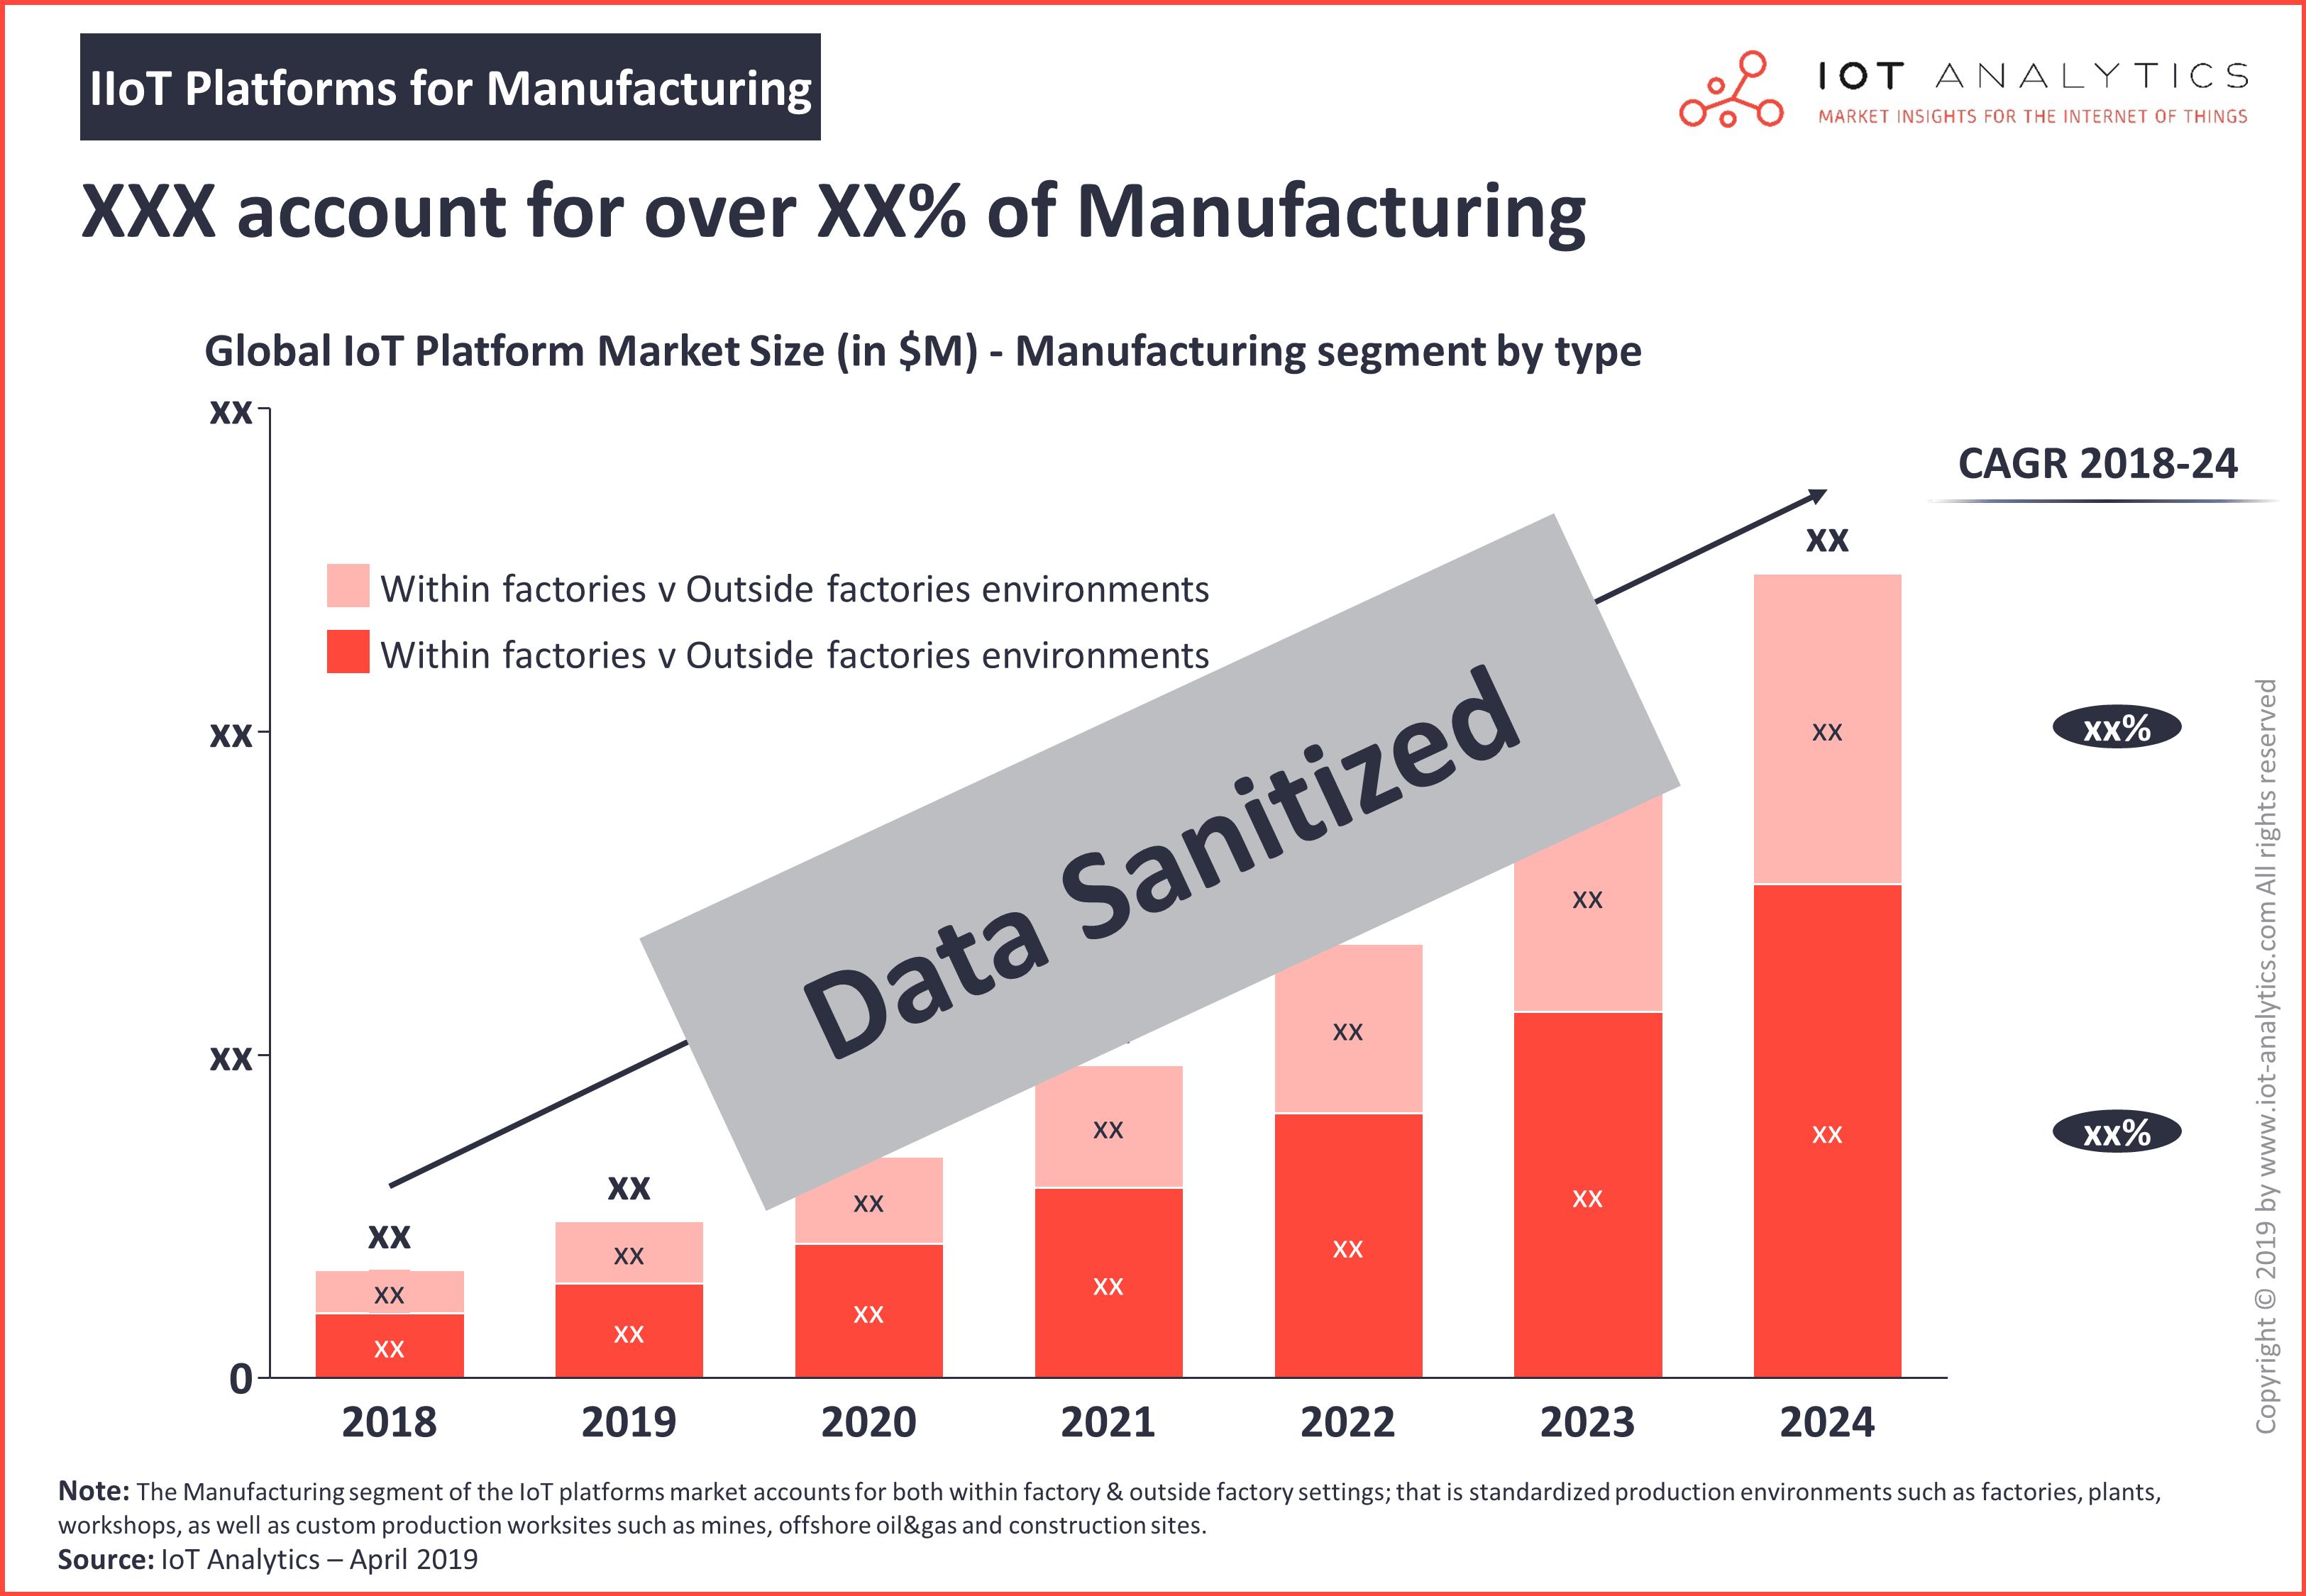 IIoT Platforms for Manufacturing 2019 - 2024 - Factory v non-factory IIoT platform market